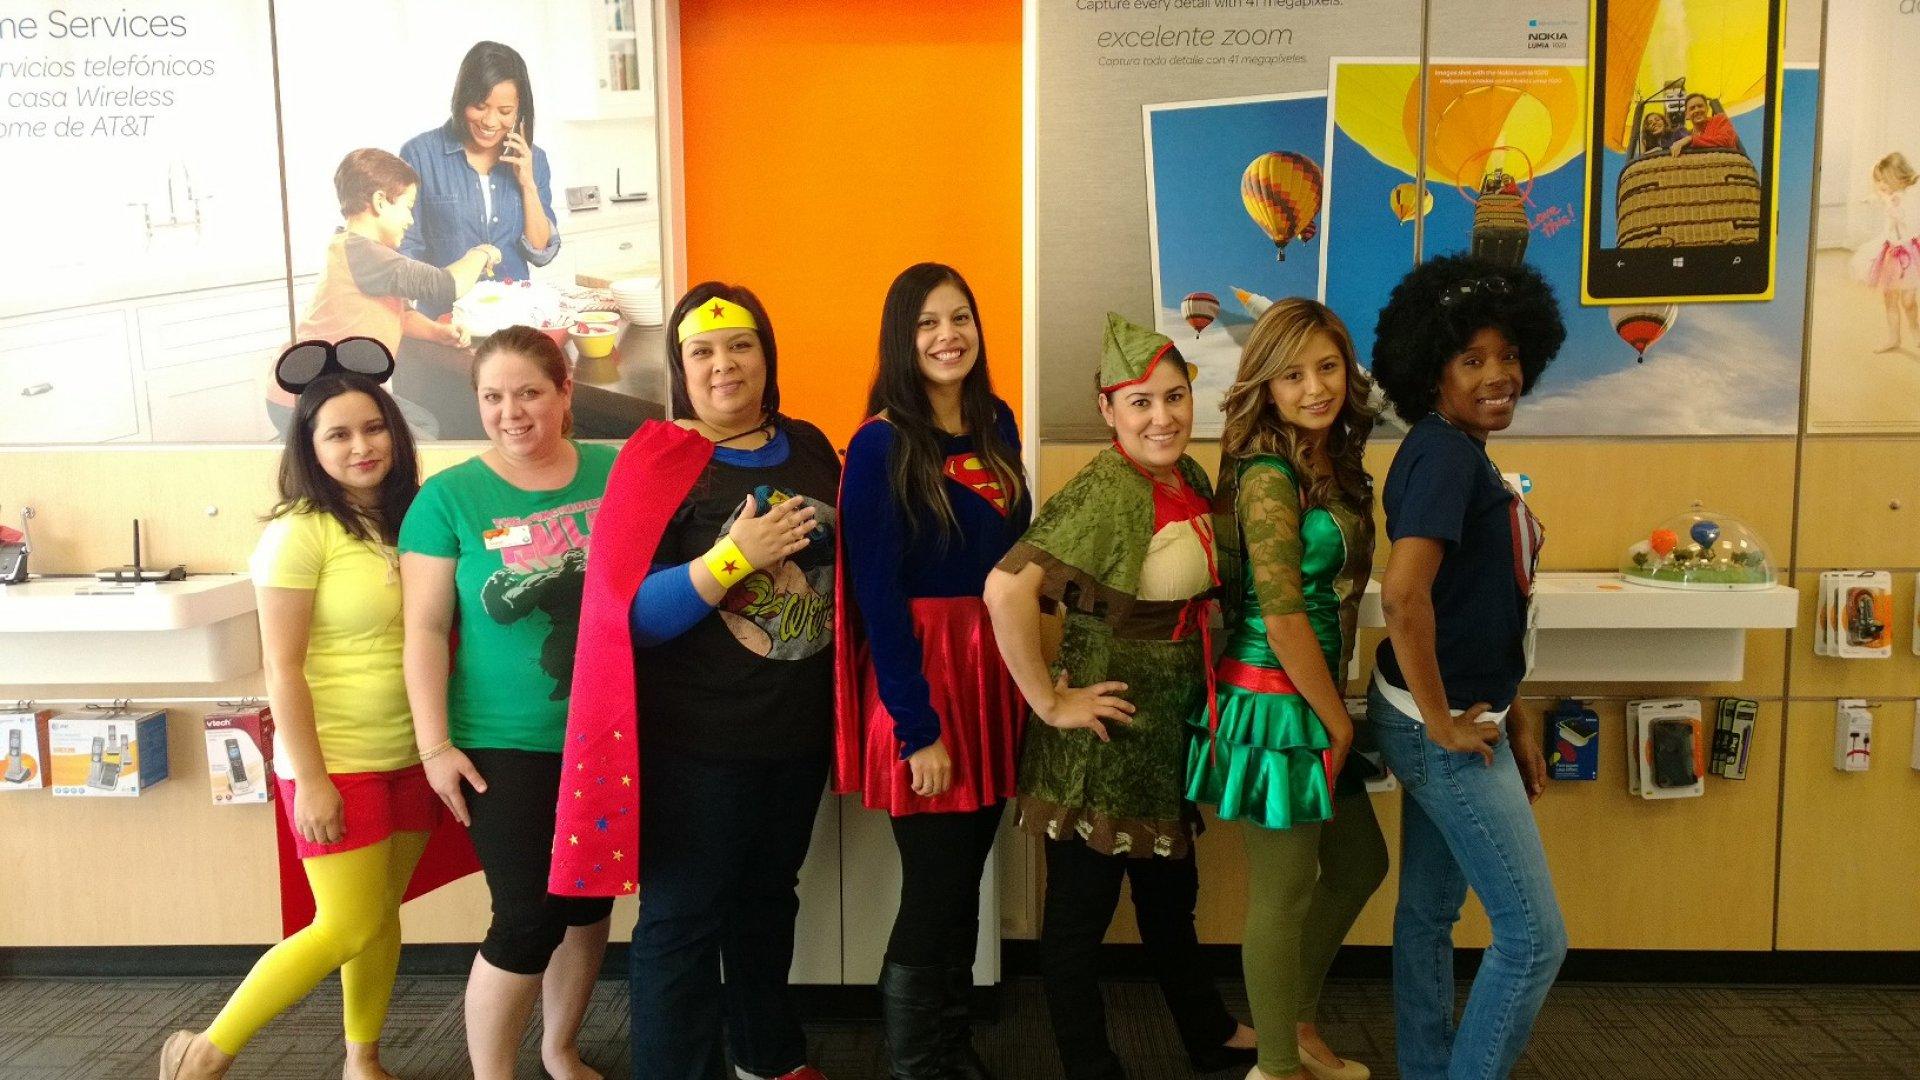 Superhero Sunday: Gimmick or Not, Customer Satisfaction Soared